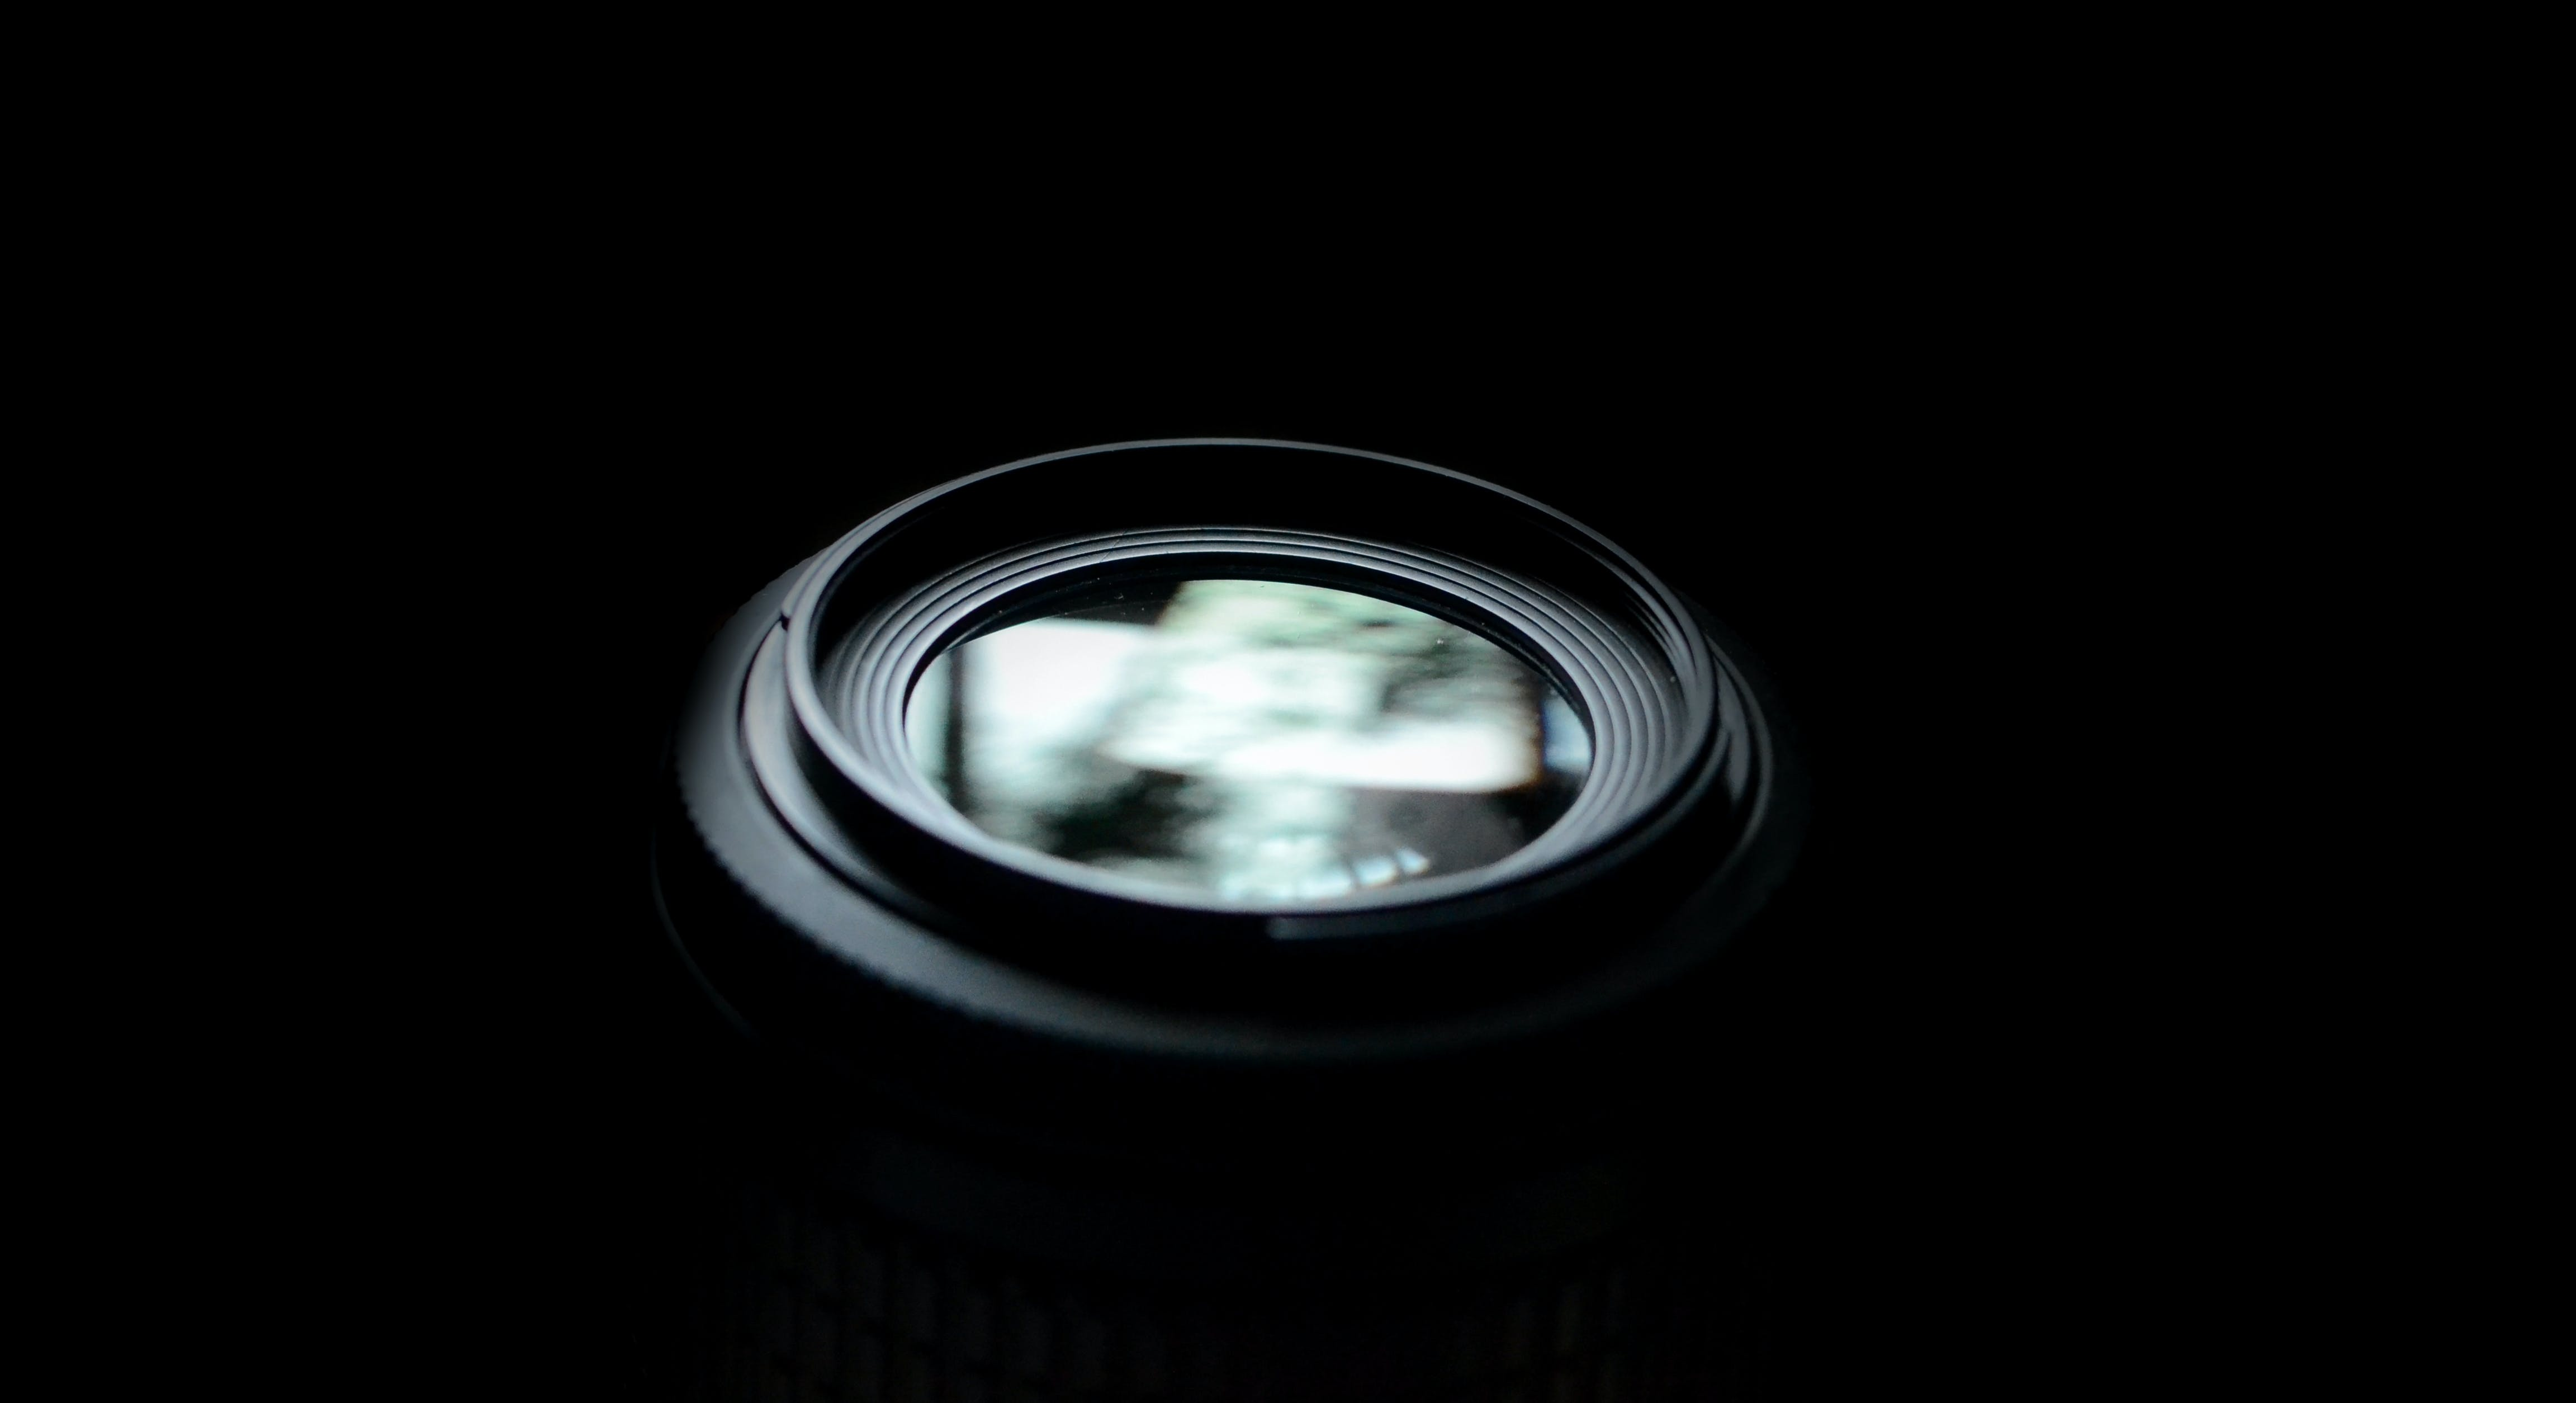 Free stock photo of Adobe Photoshop, camera, camera lens, dslr